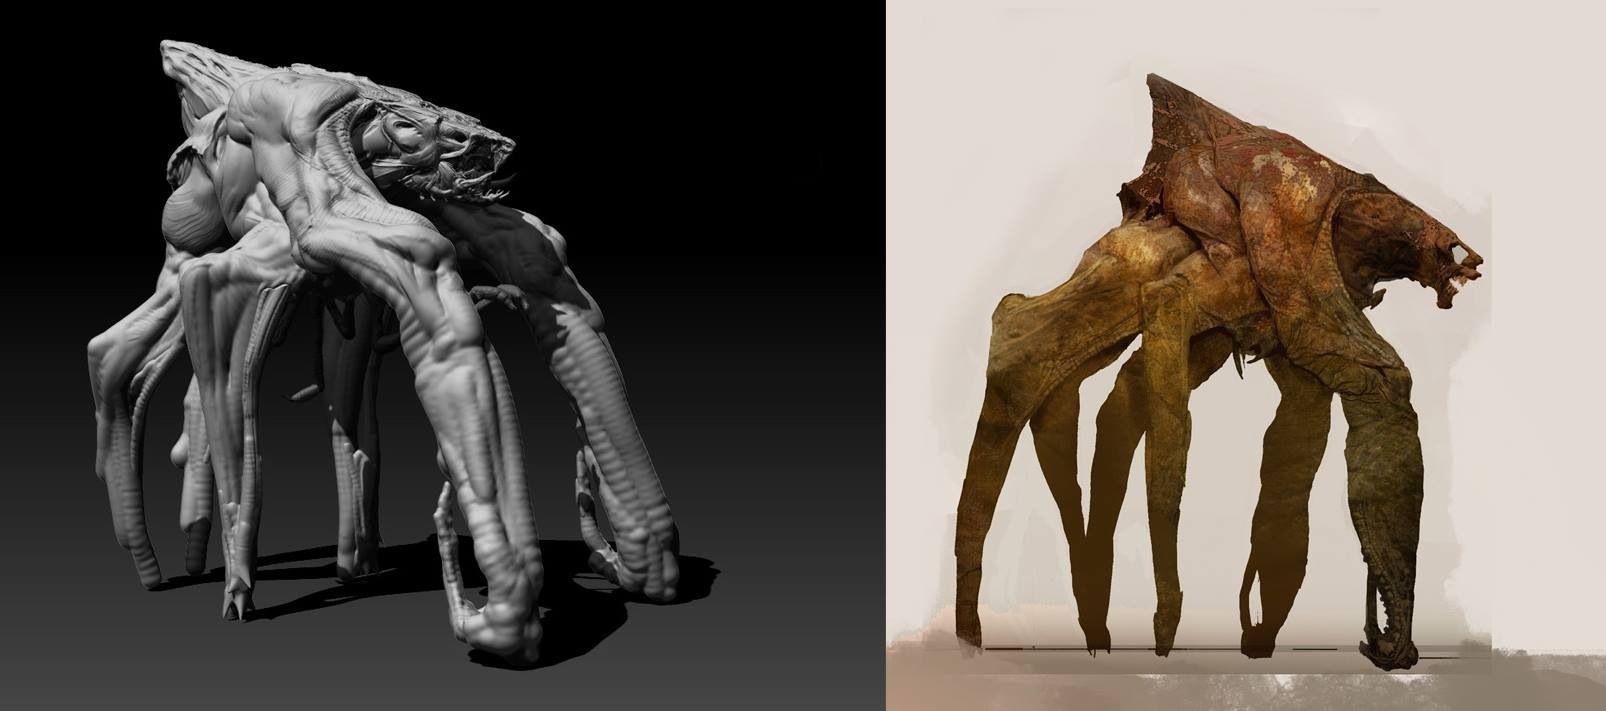 Muto Creature Design for Godzilla 2014 by Vance Kovacs